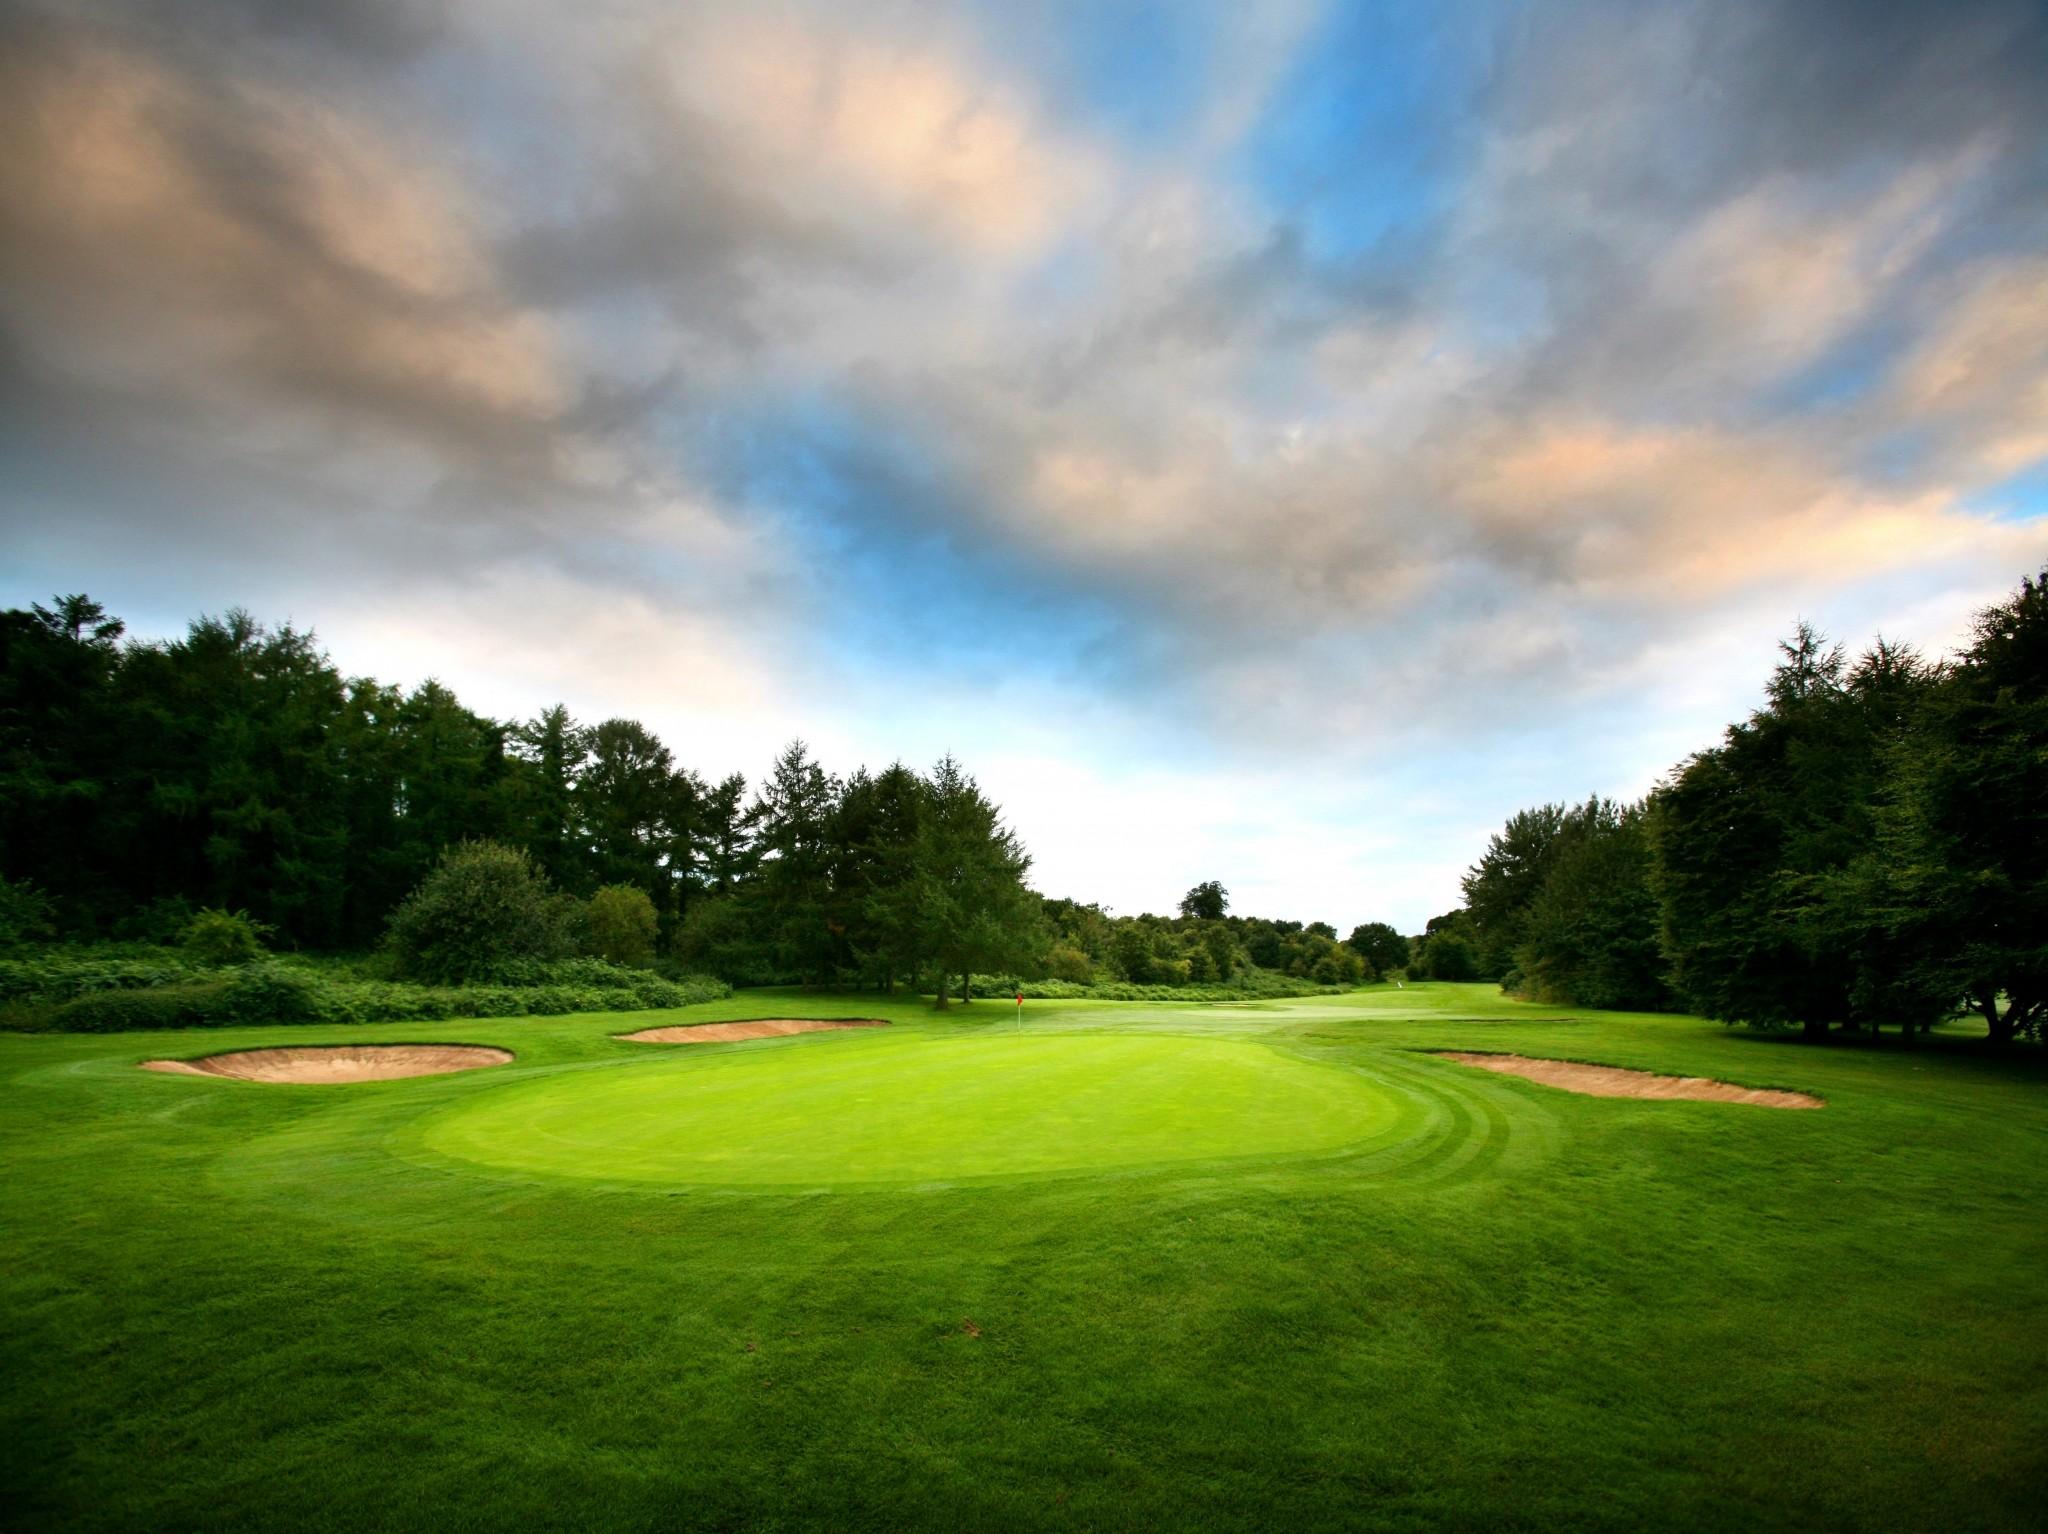 golf beautiful backgrounds desktop